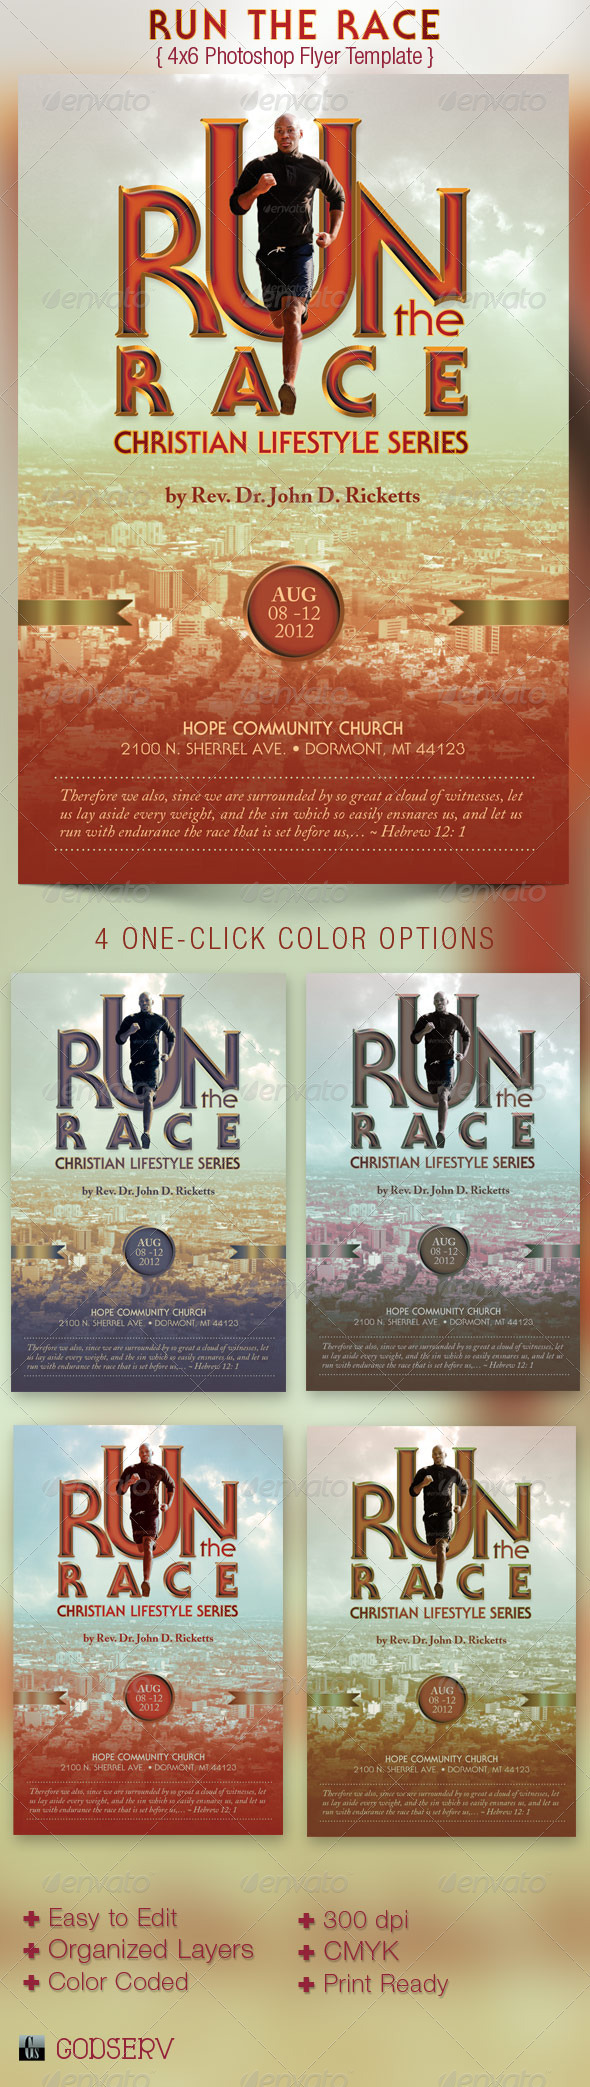 Run Race Church Flyer Template - Church Flyers